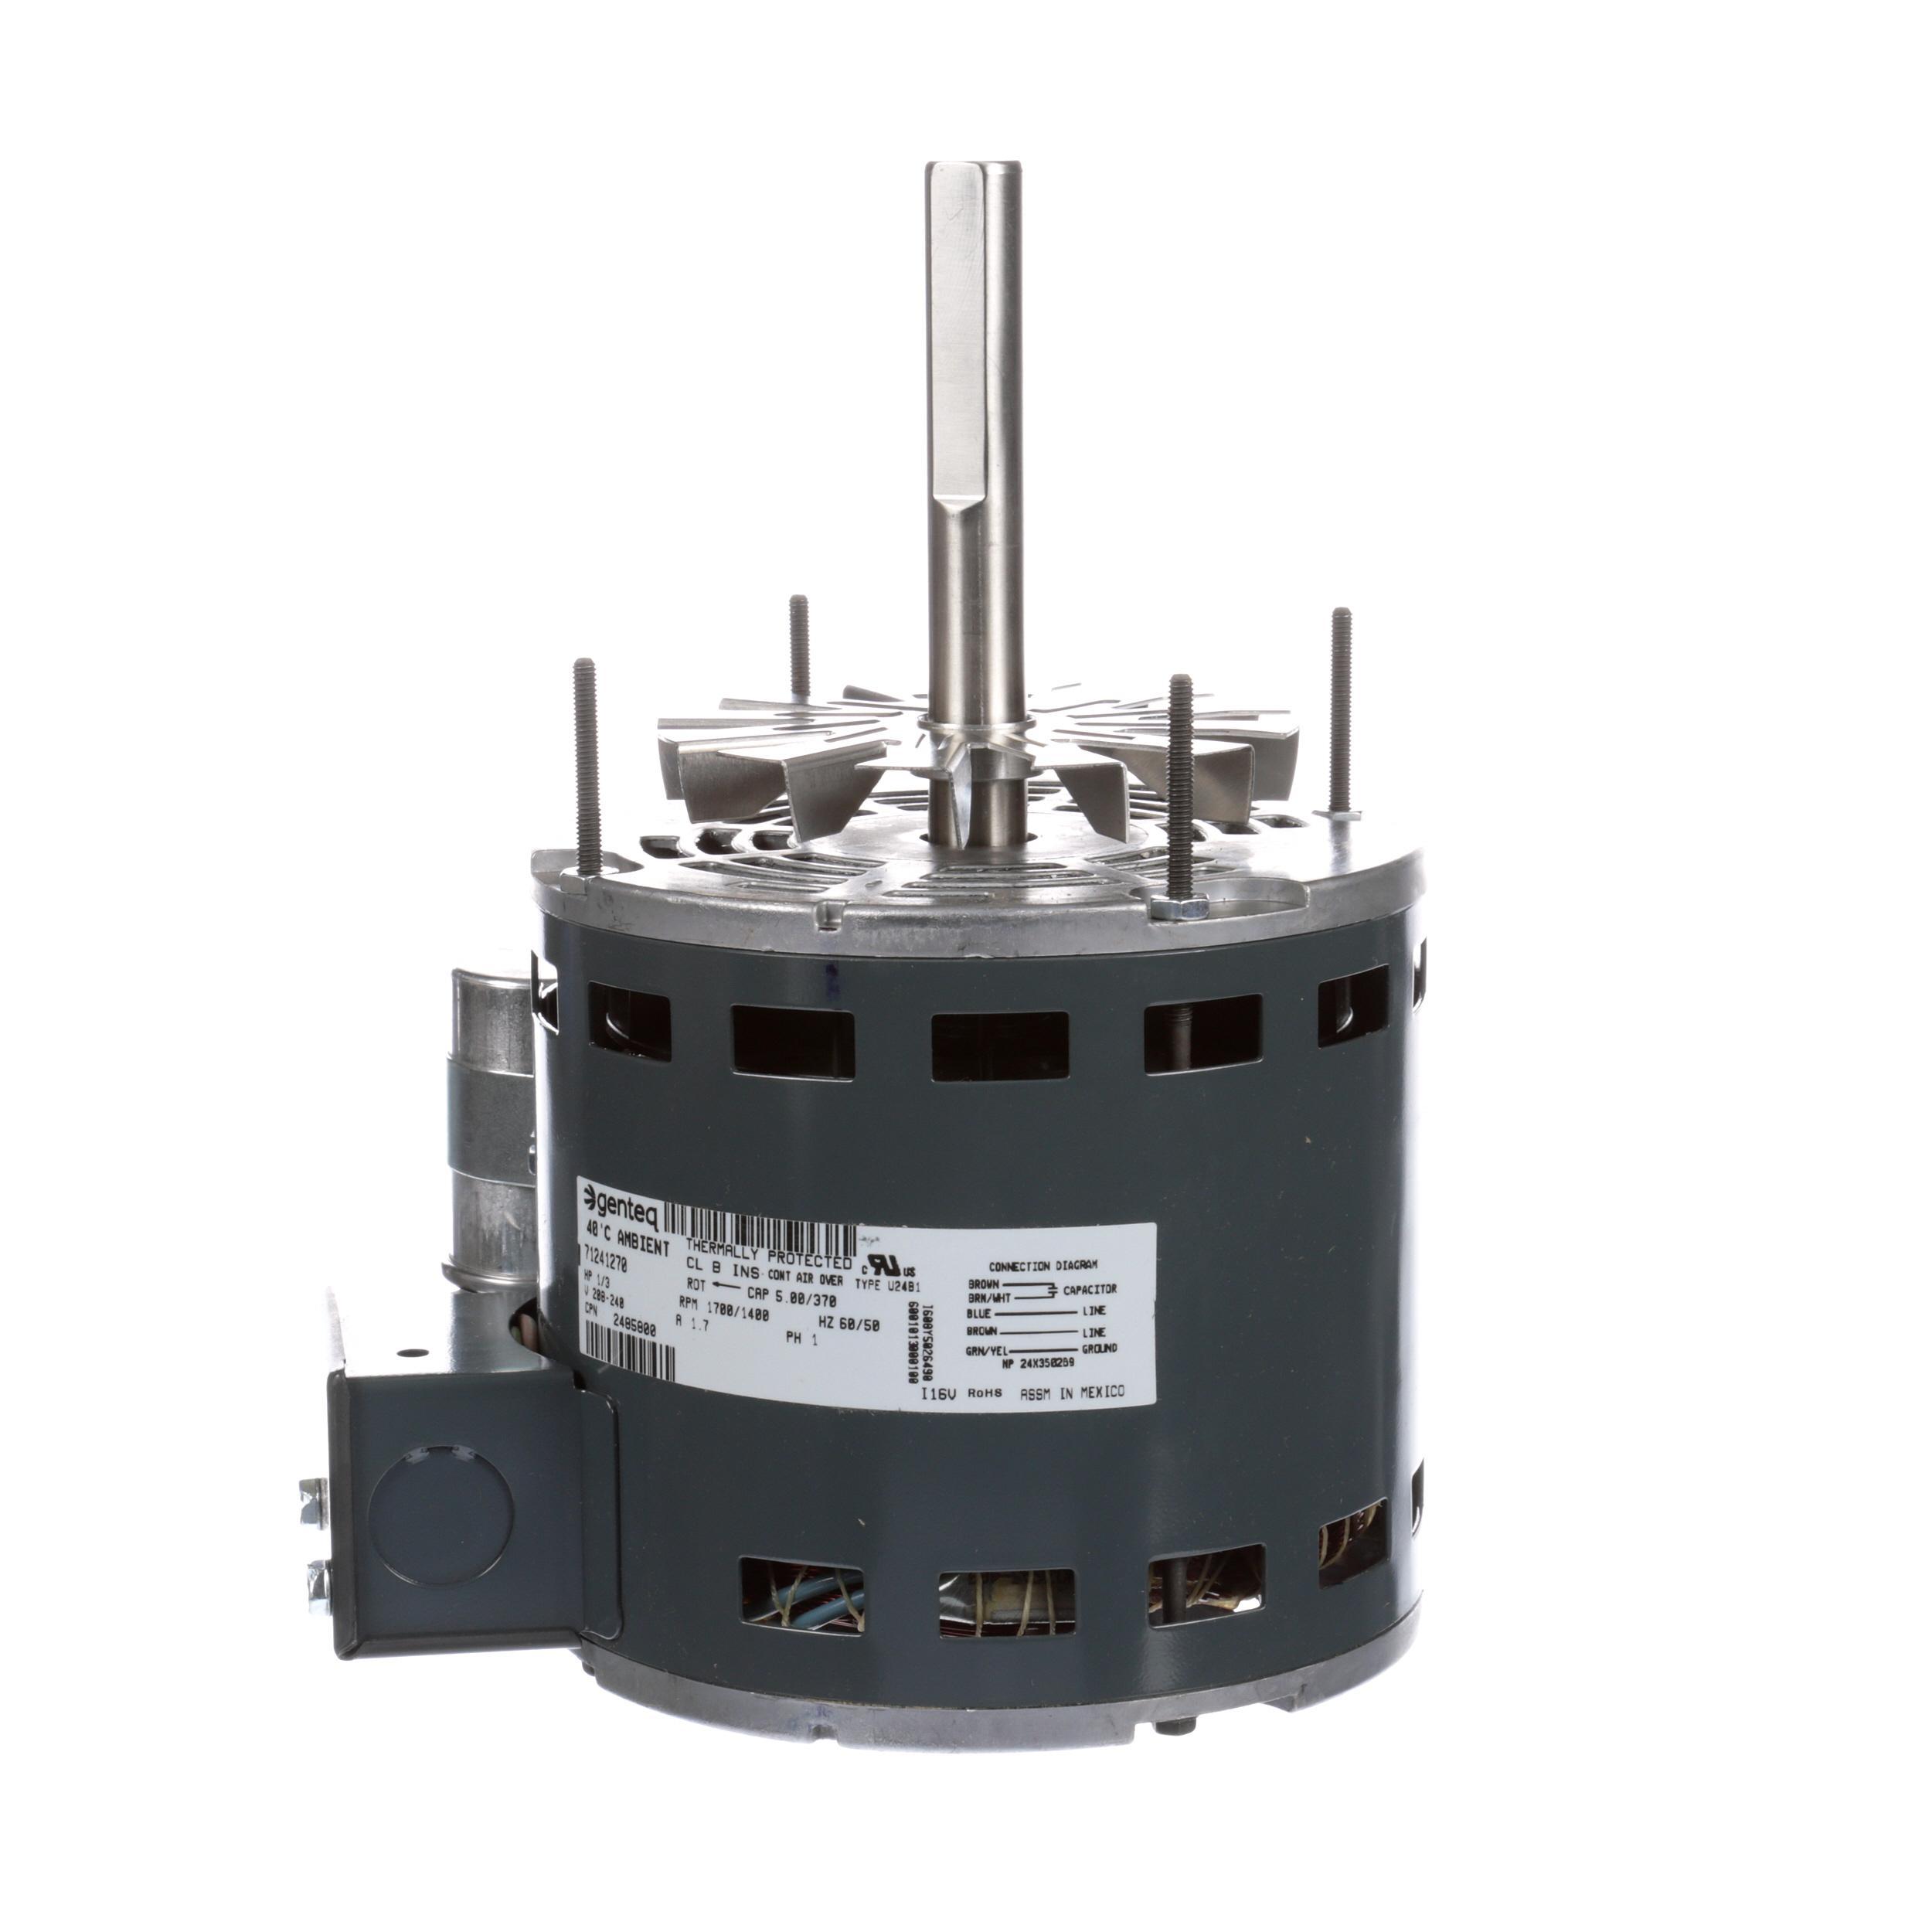 garland motor psc 1 3 hp 208 240v 50 6 part 2485800